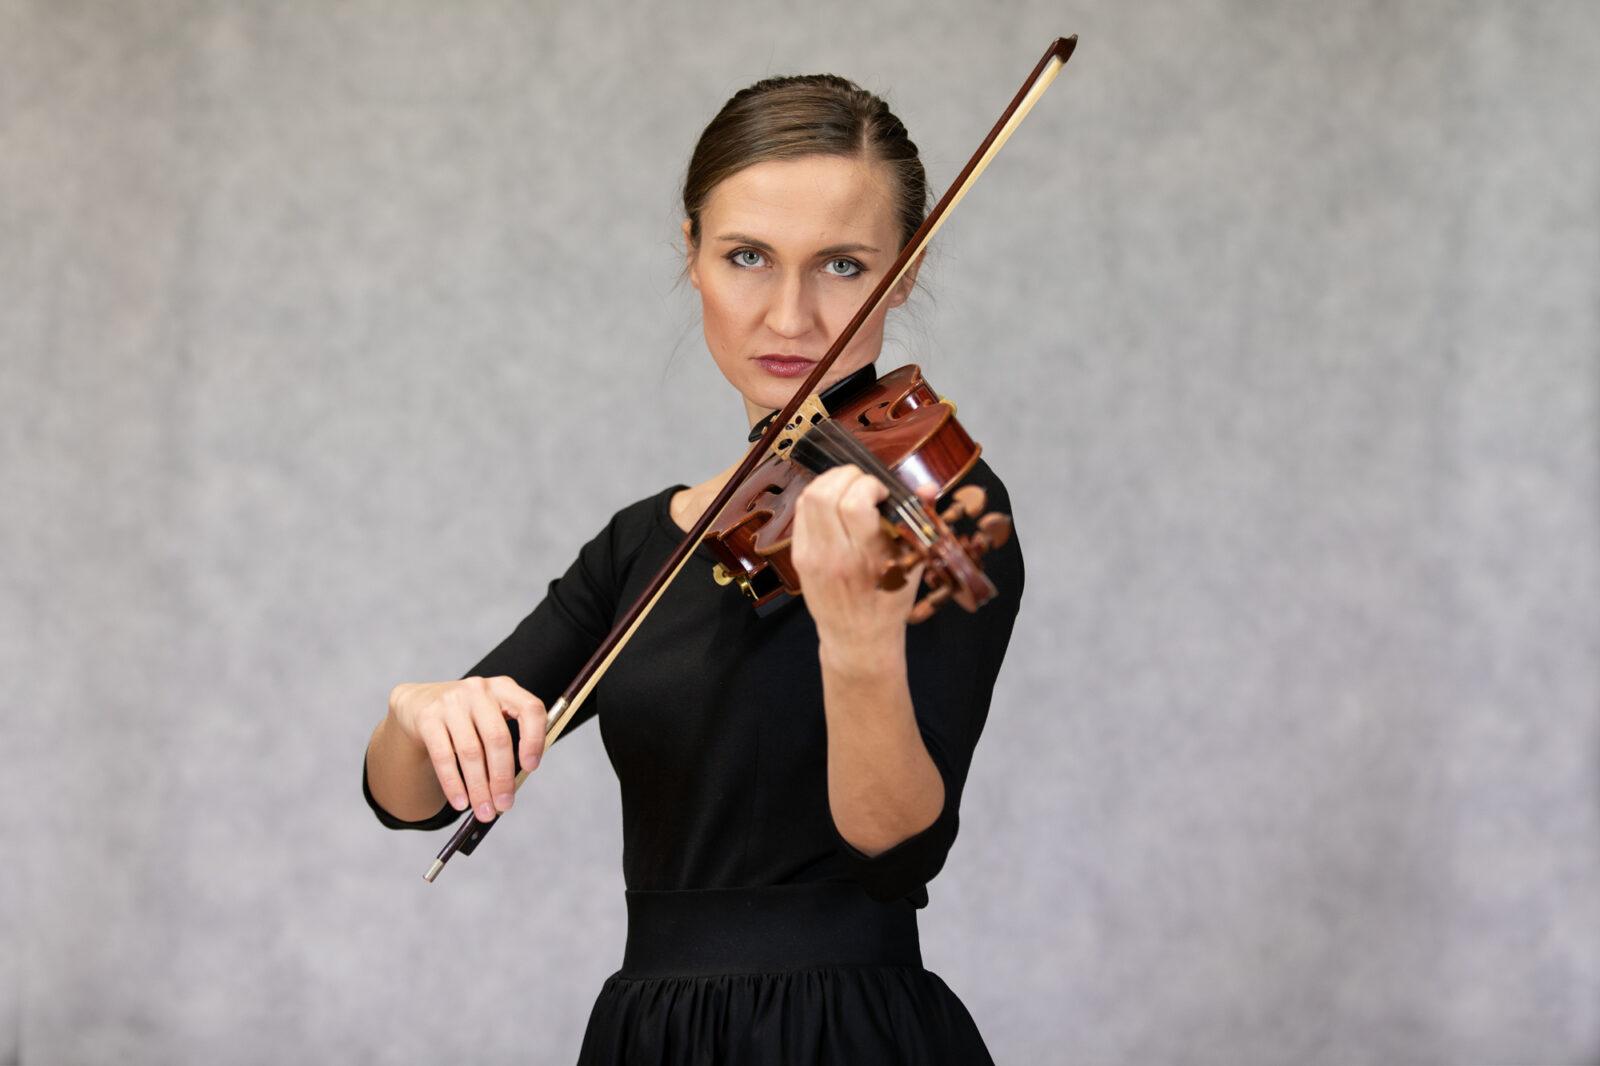 Lidia Treszczotka